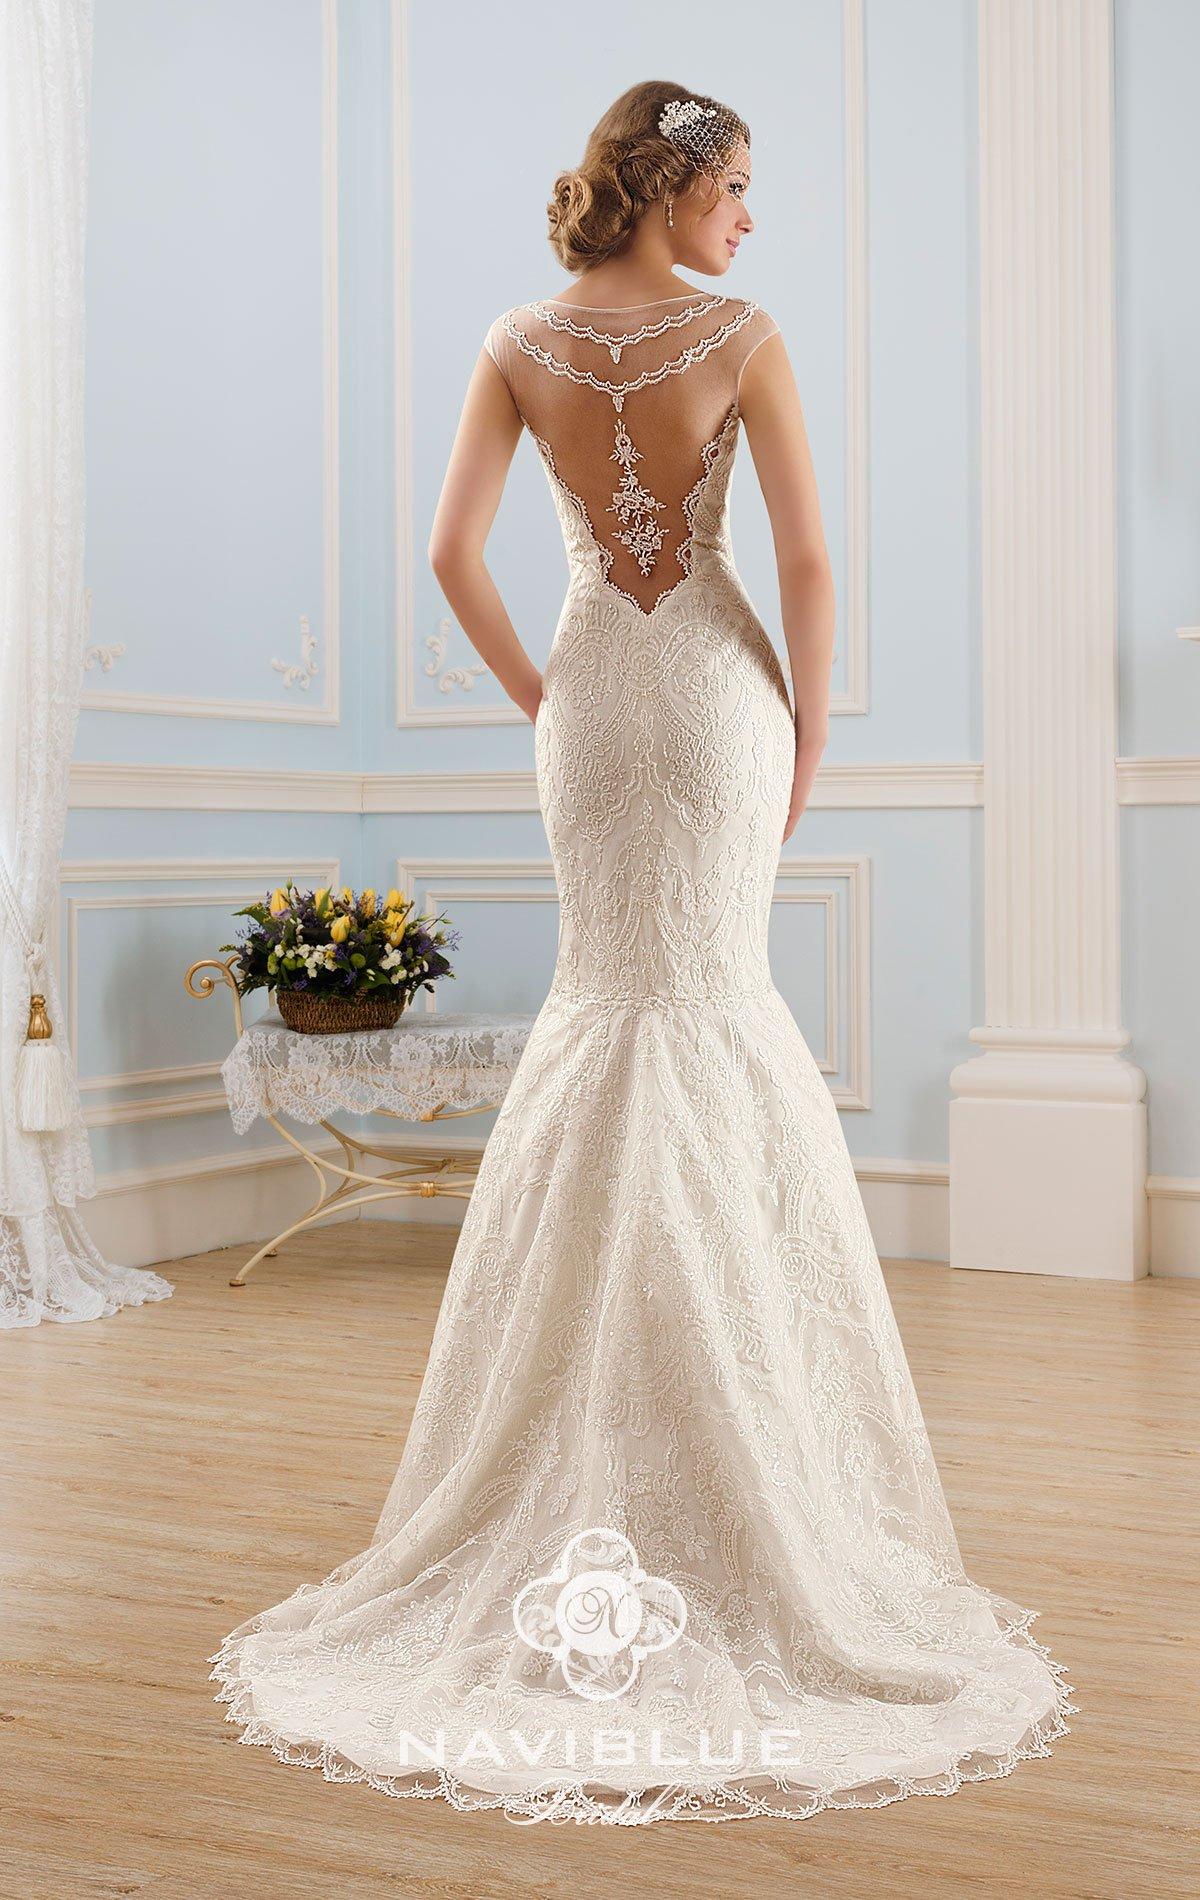 Naviblue Bridal 13039